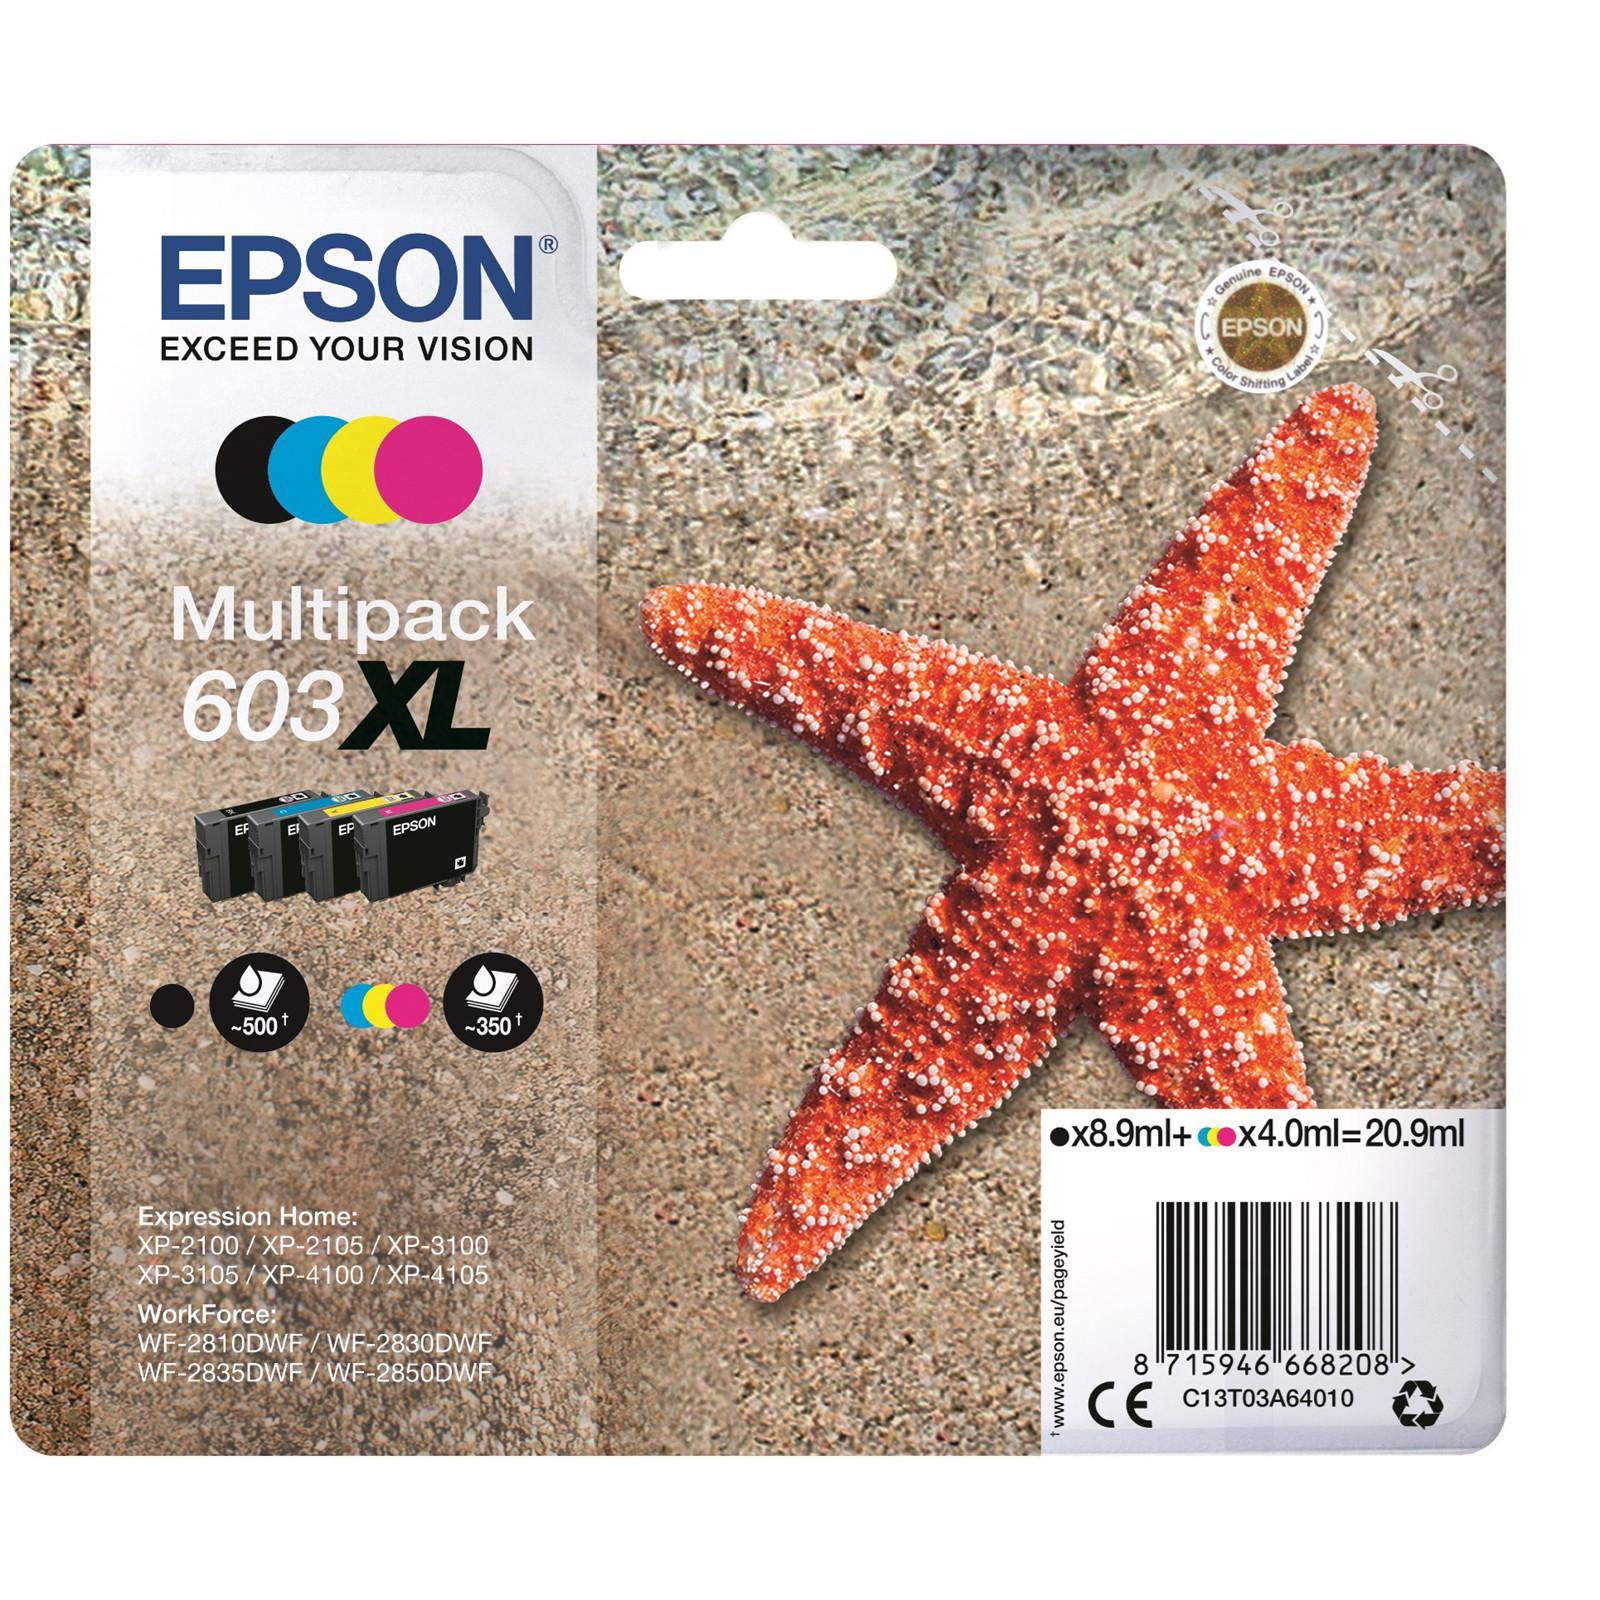 Epson T03U Multipack 4-colours 603XL Ink Cartridge w/alarm